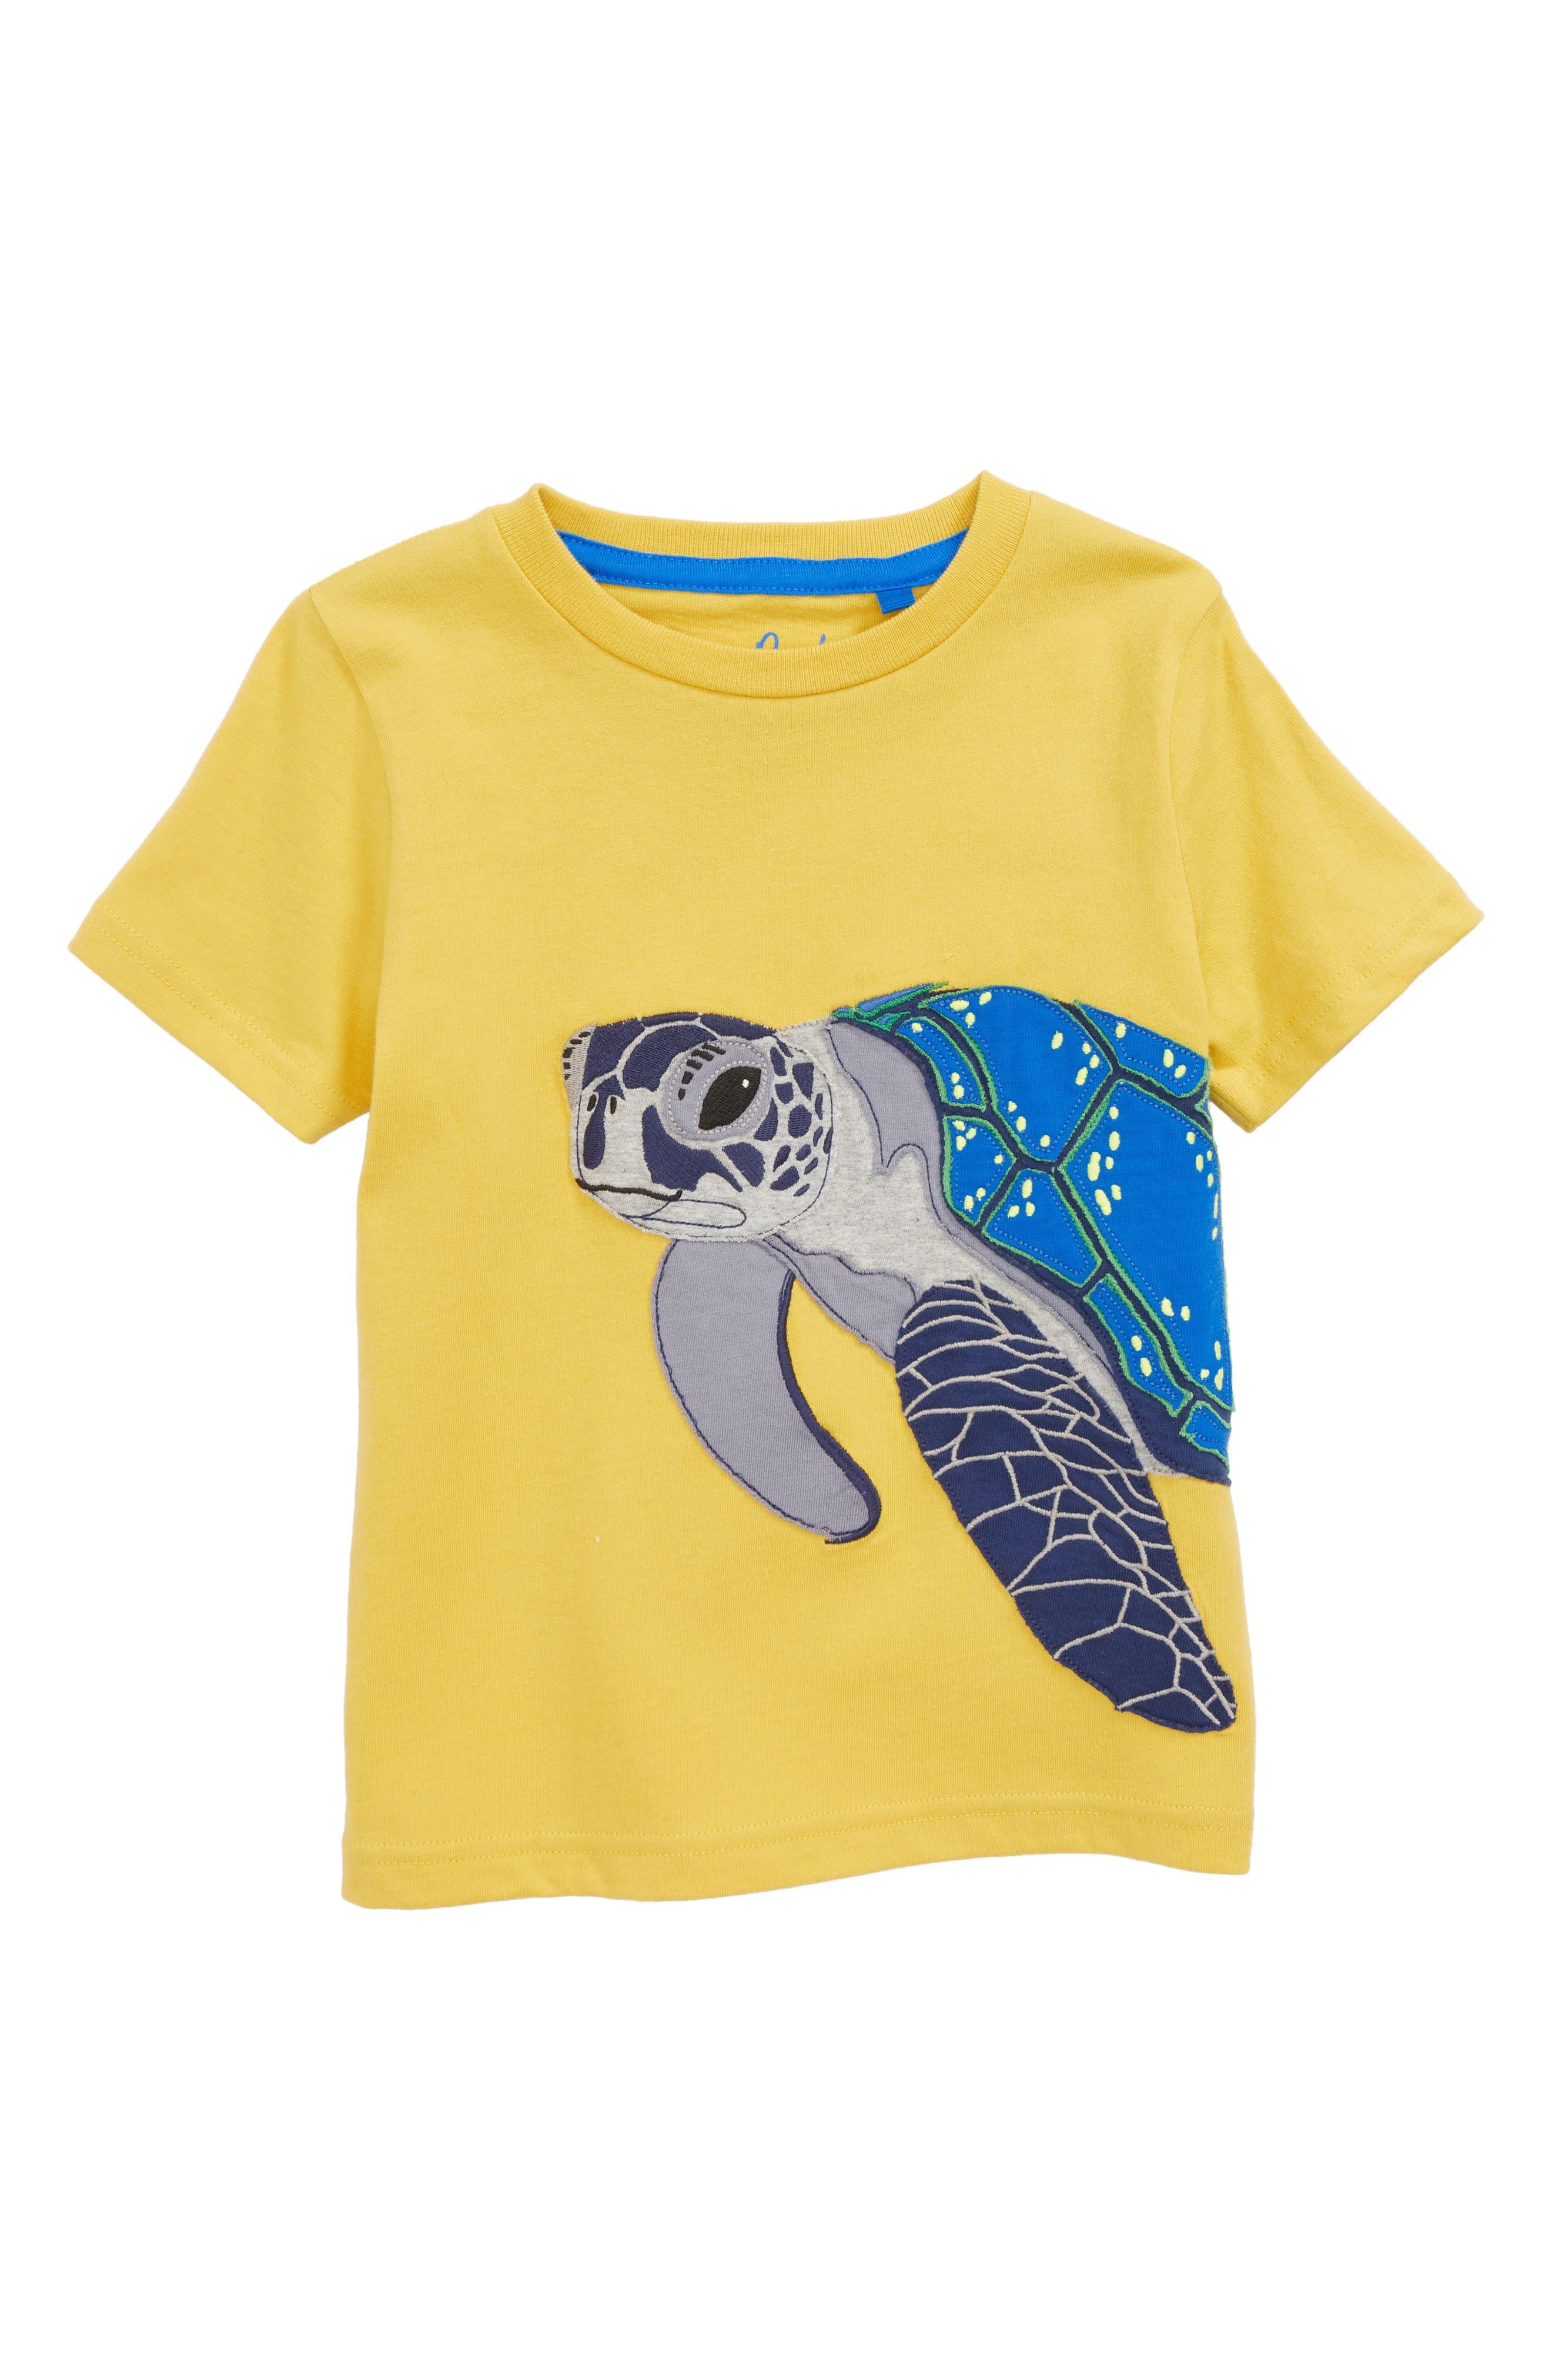 Turtle Appliqué T-Shirt,                             Main thumbnail 1, color,                             Sweetcorn Yellow Sea Turtle